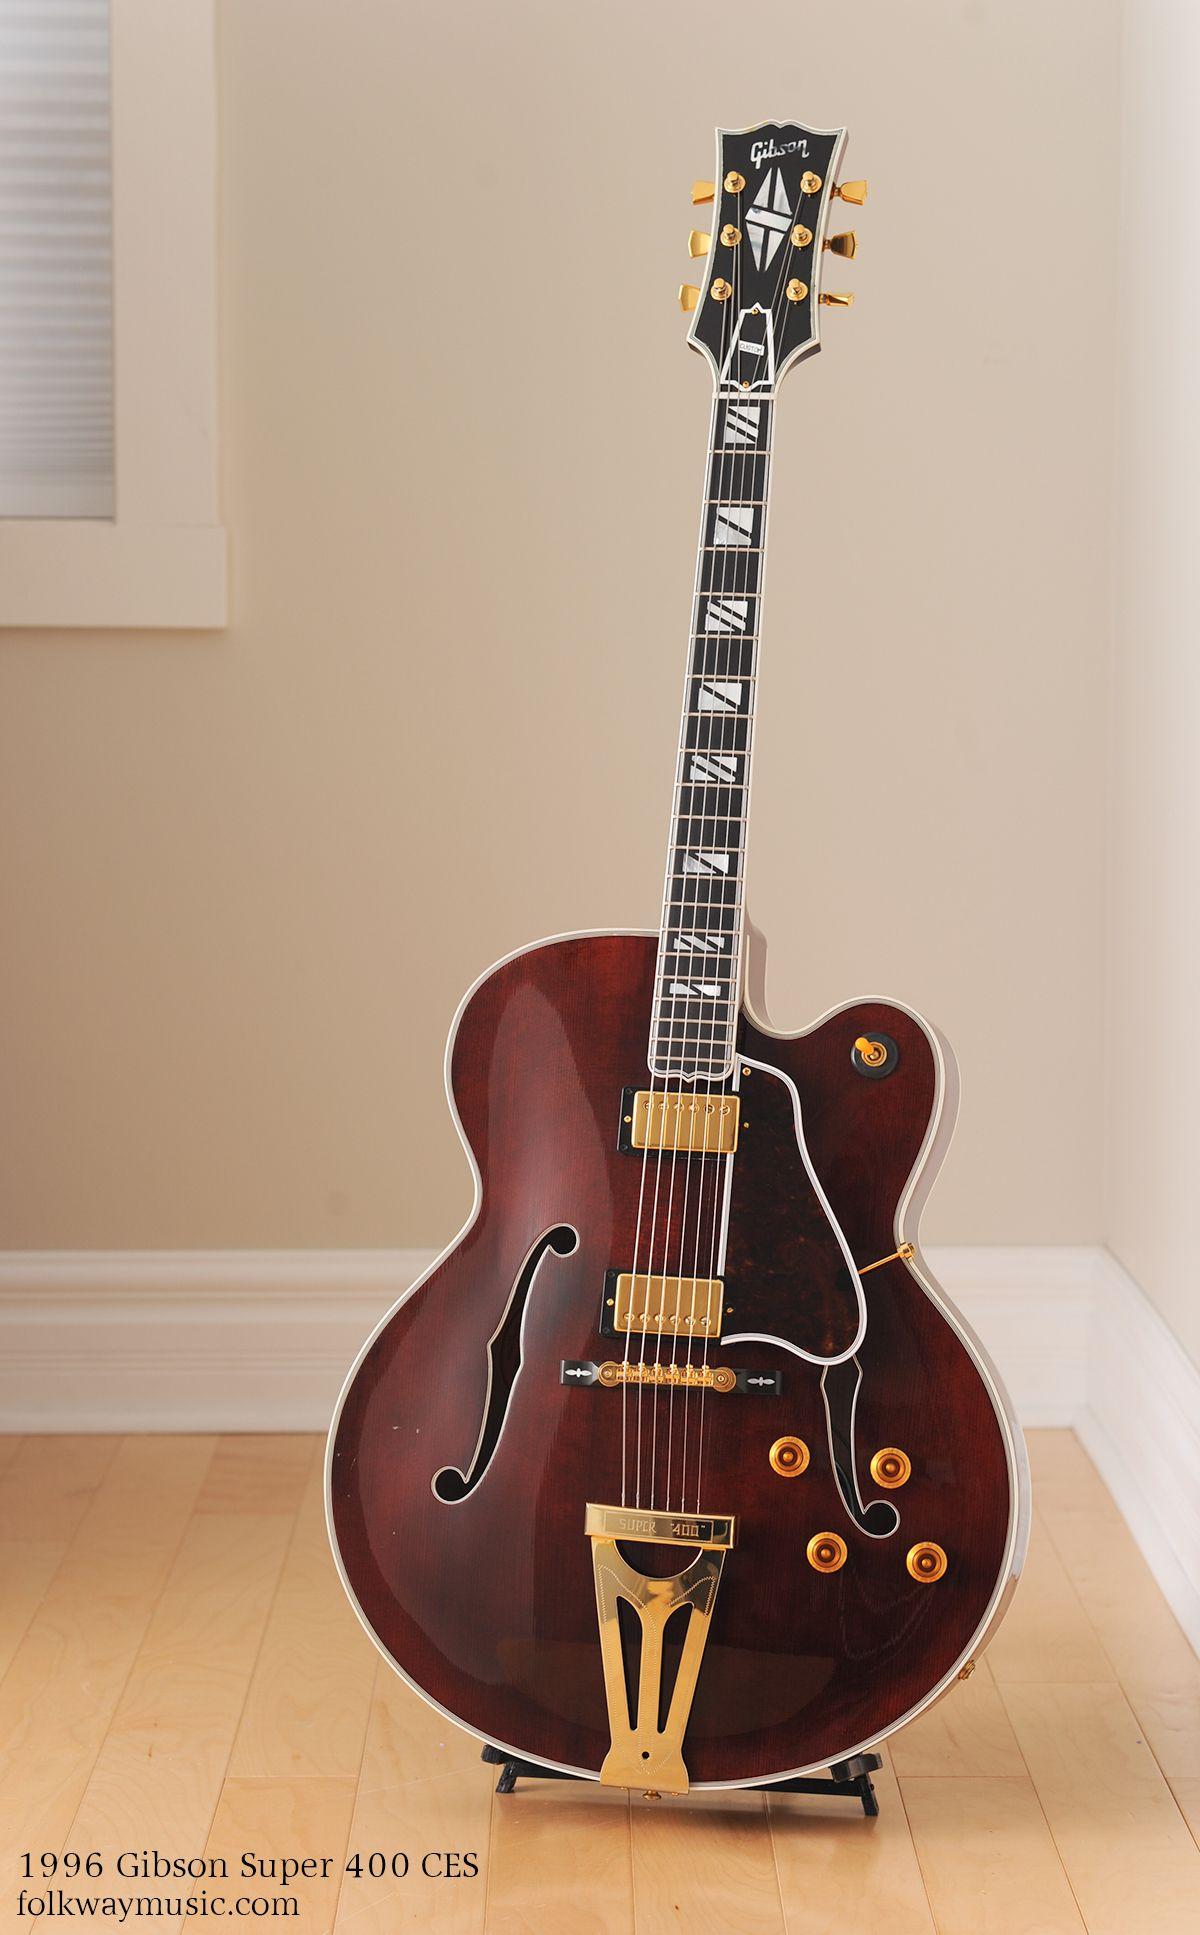 Gibsonsuper400ces 0317 Main 1489698542 Jpg 1200 1935 Vintage Guitars Cool Electric Guitars Gibson Guitars